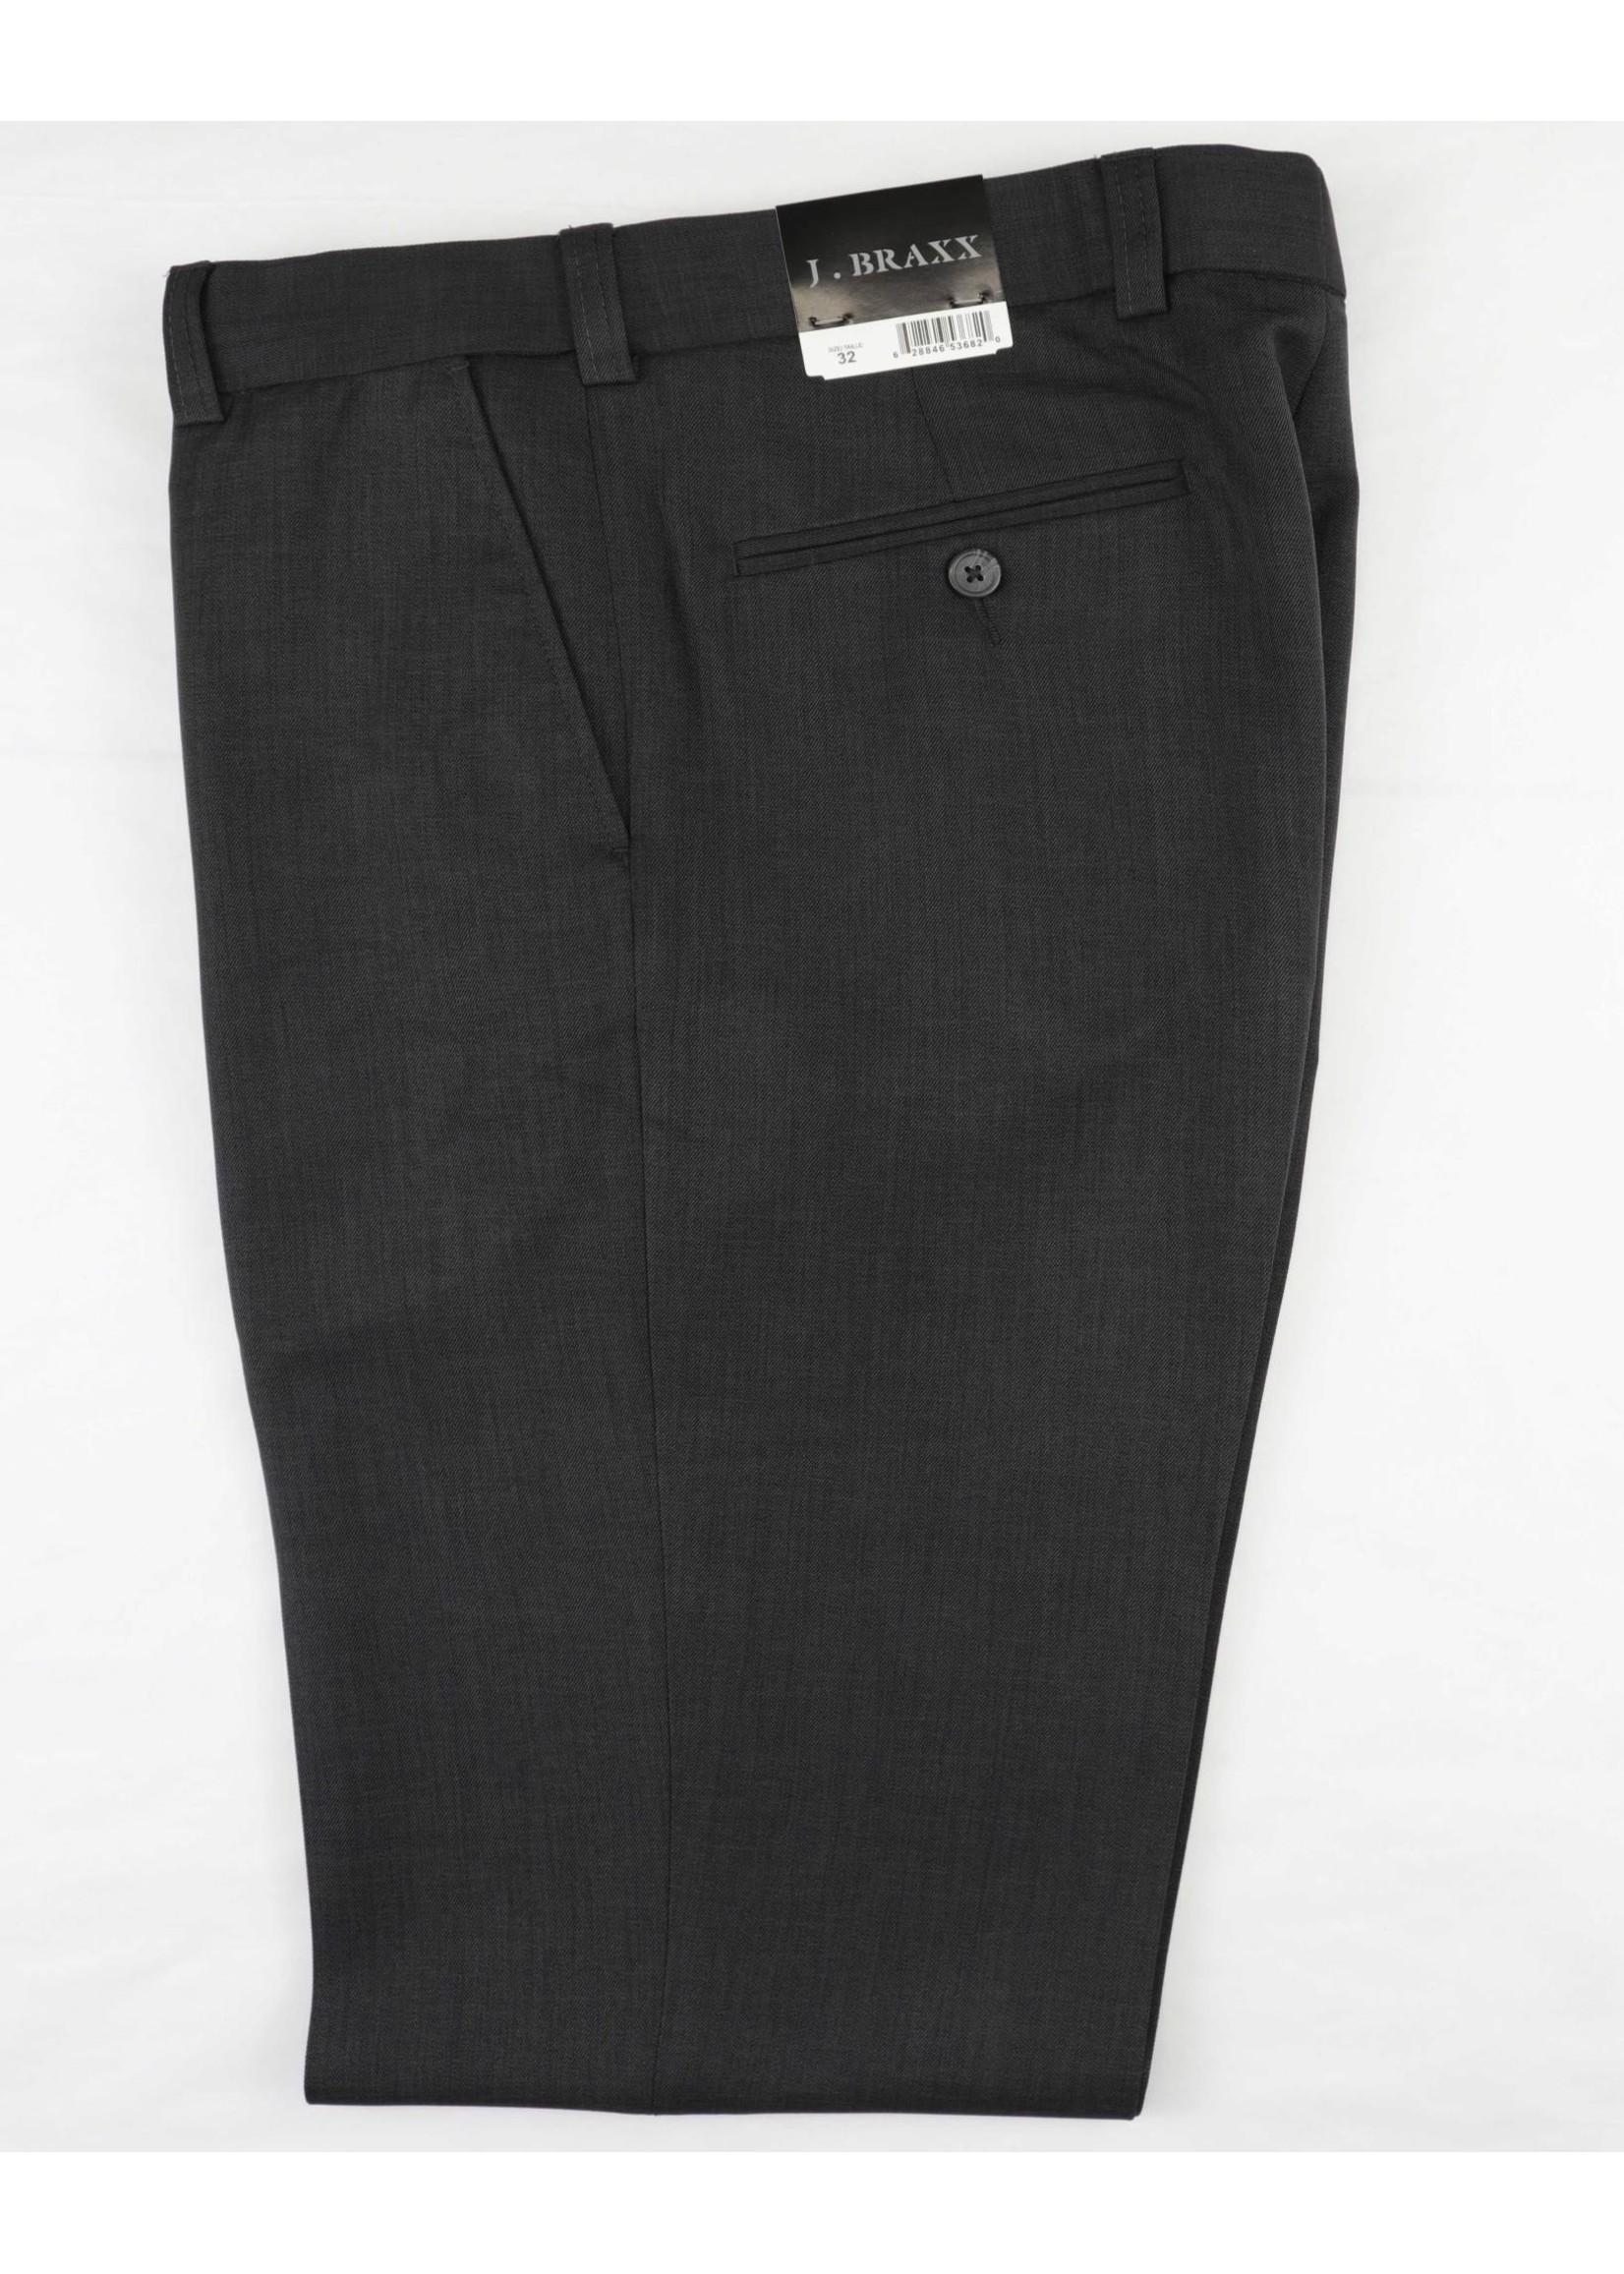 J Braxx J Braxx - Polyester Dress Pant (2323)